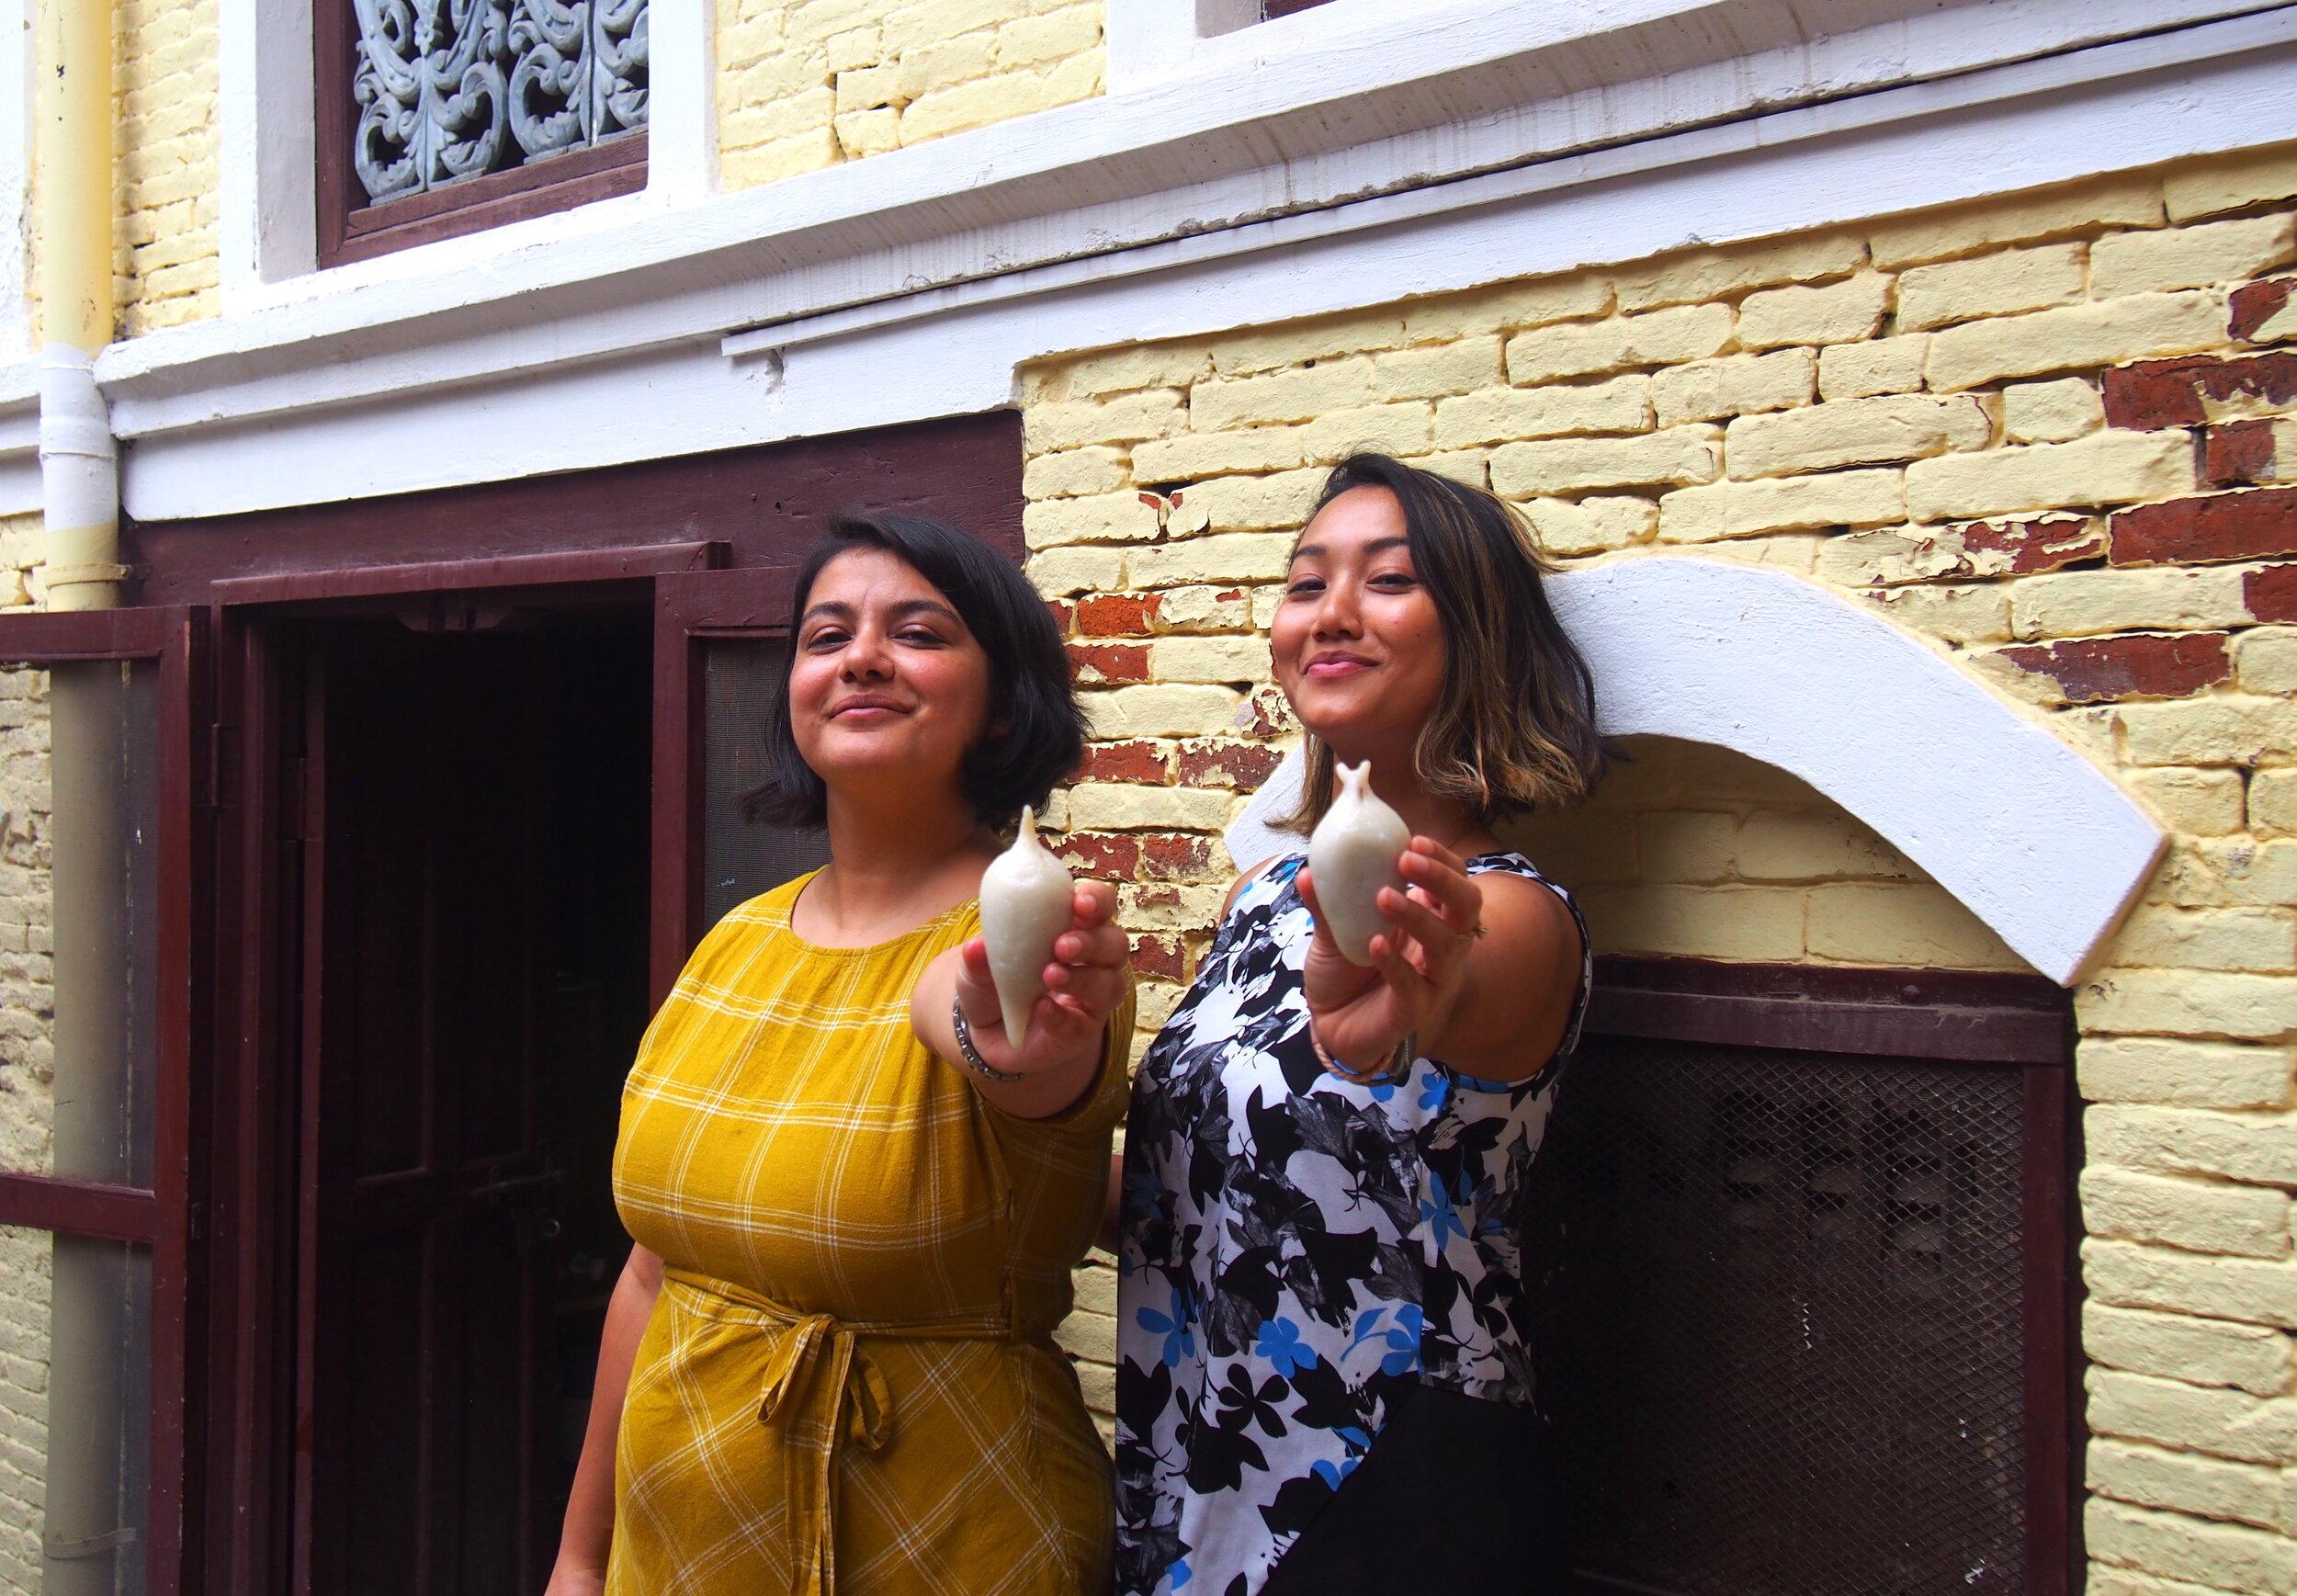 Meet the organiser duo. Aji's co-founder Lorina (right) and #MakerKT co-founder Priya (left).